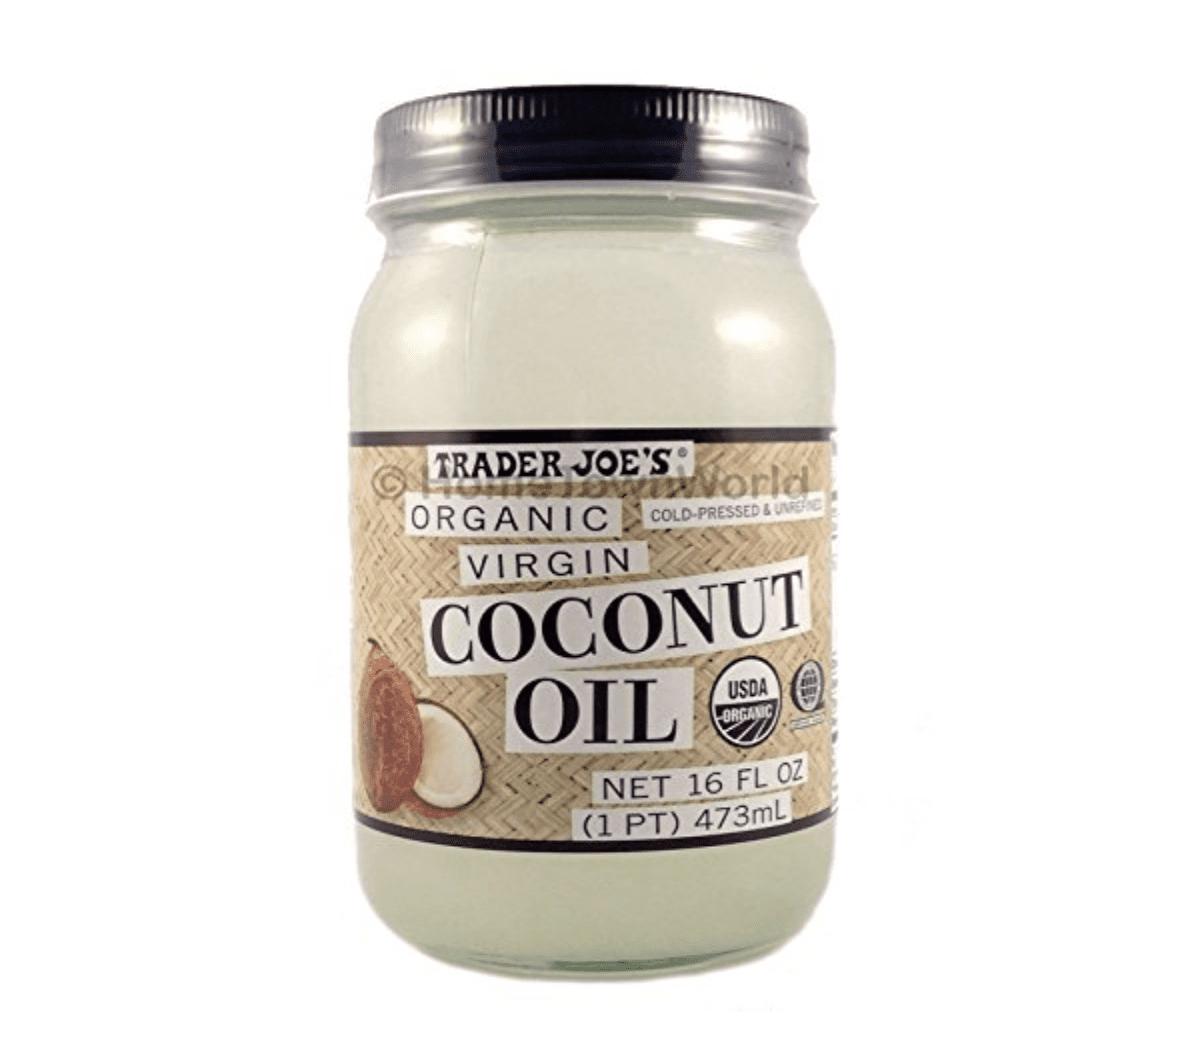 The virgin coconut oil